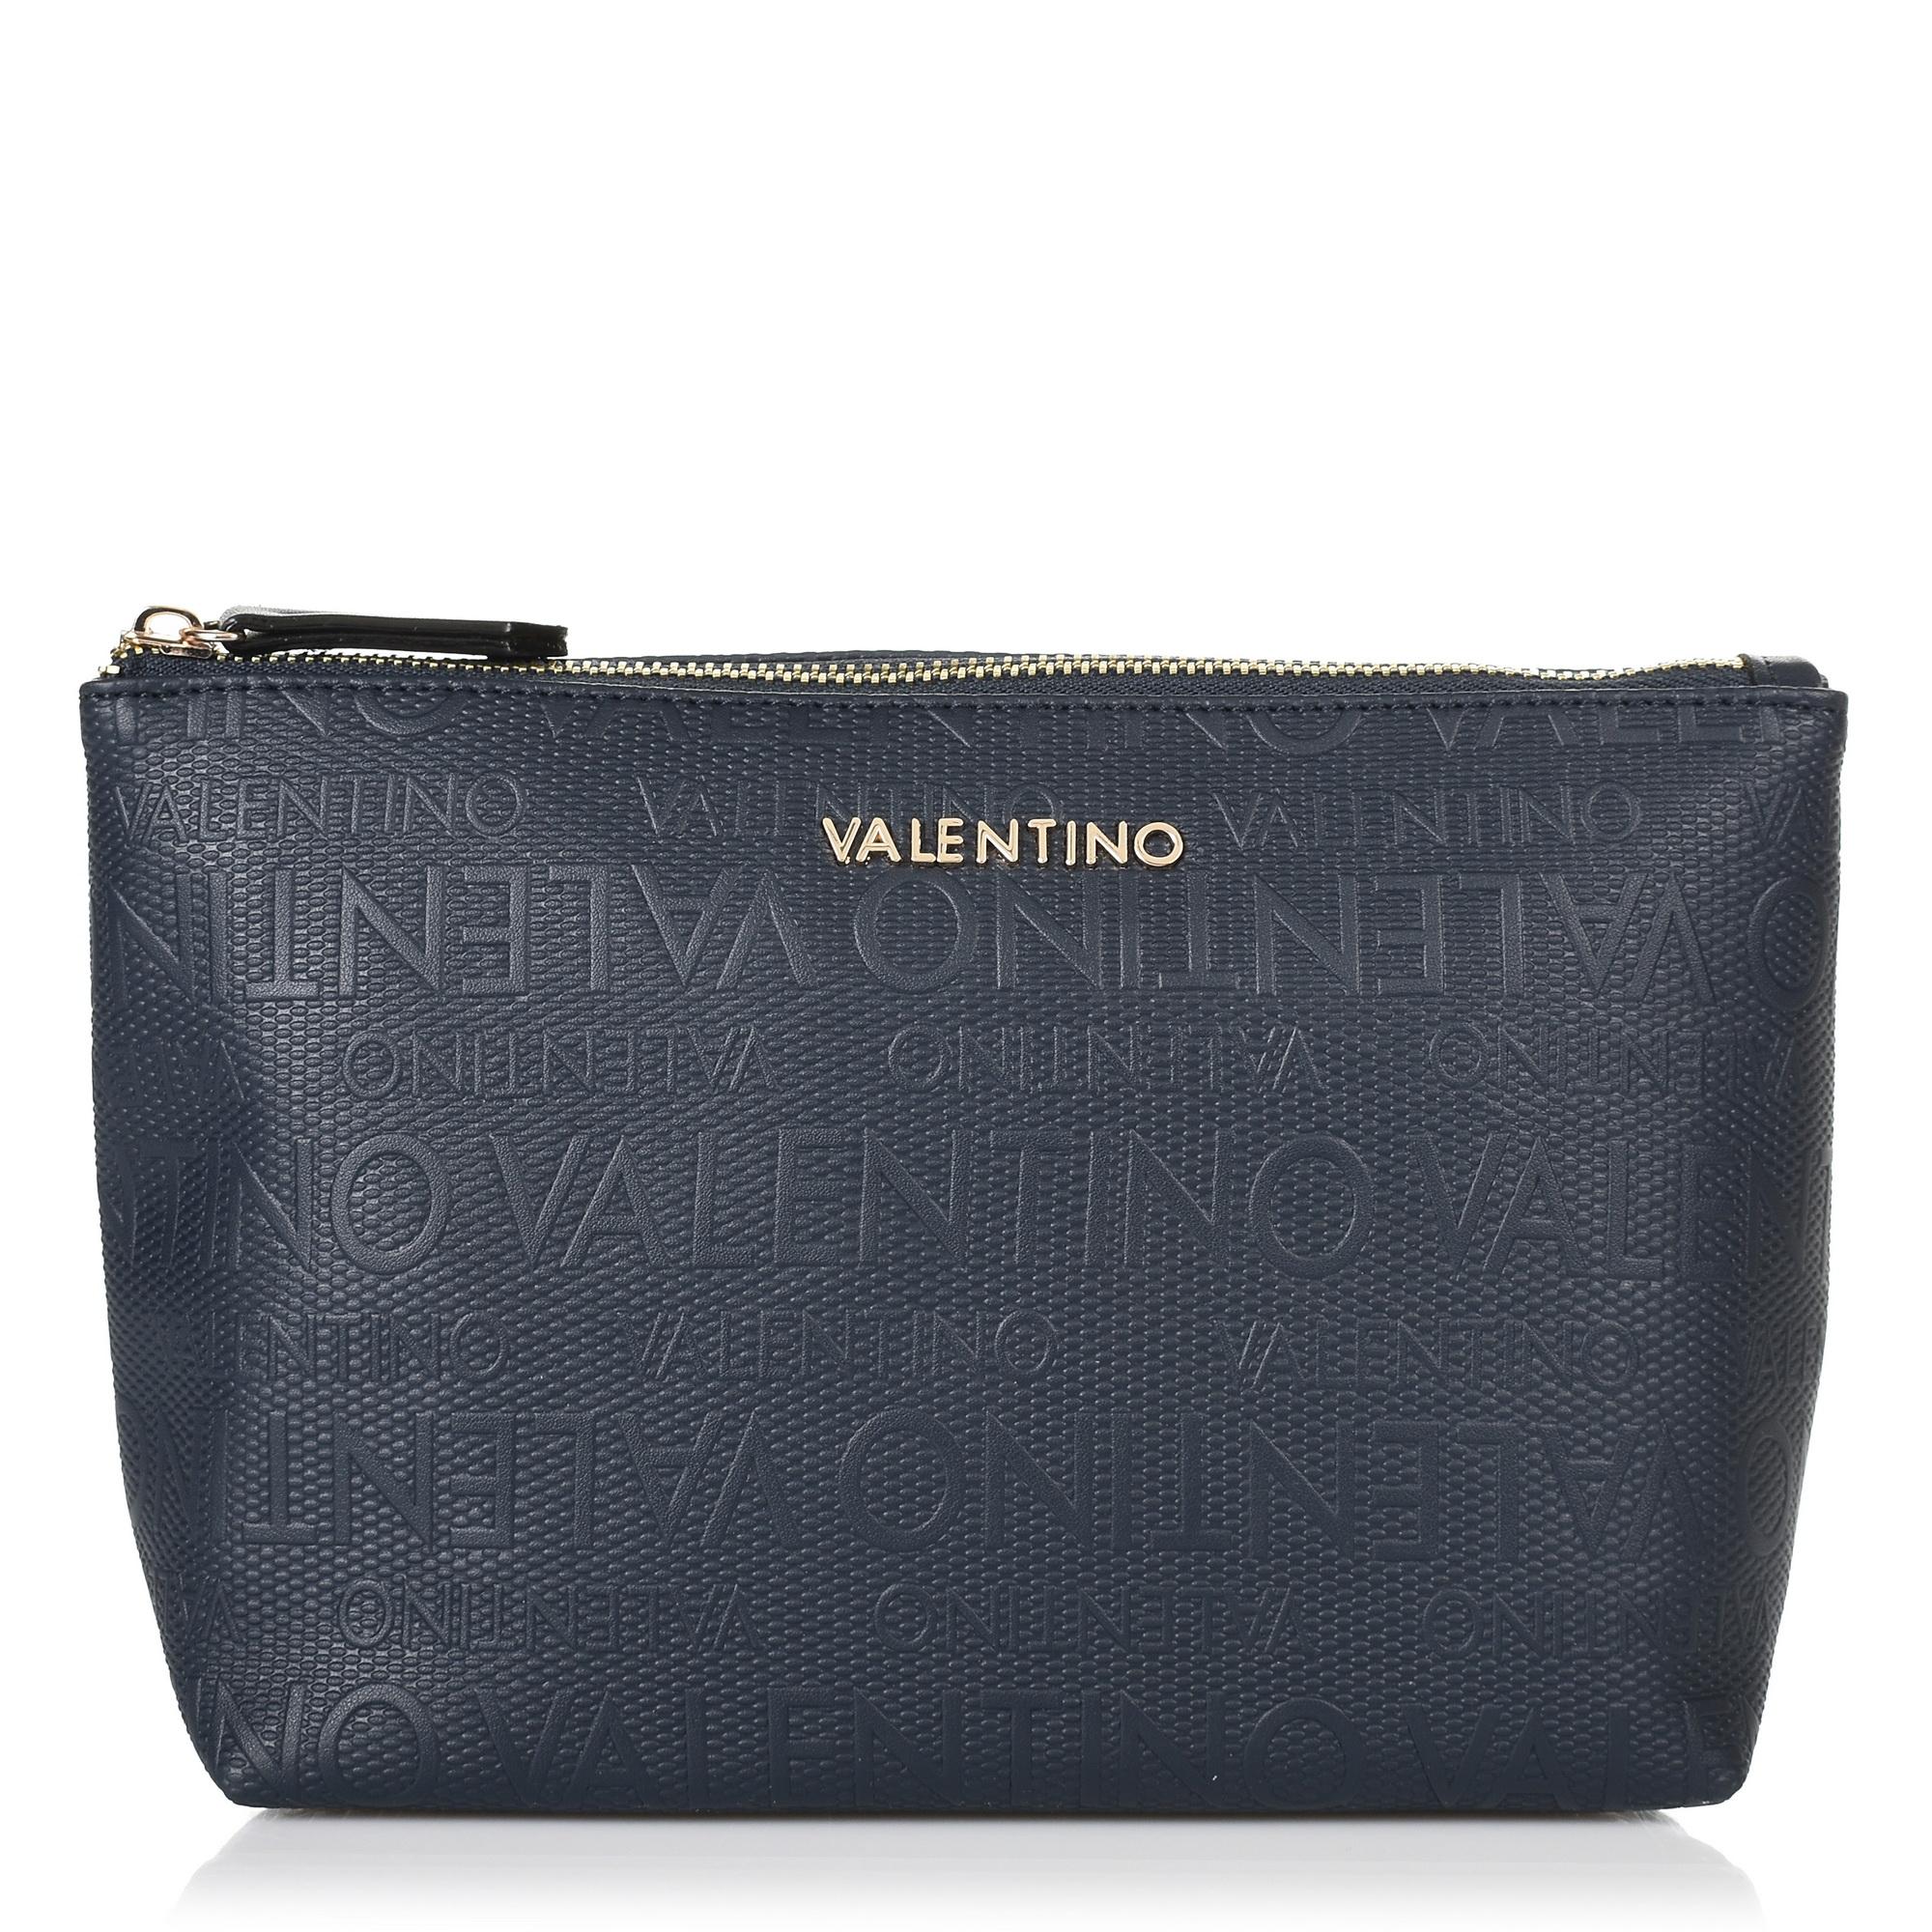 6250e4a9ee Brand Bags Νεσεσέρ Valentino Dory VBEYC513